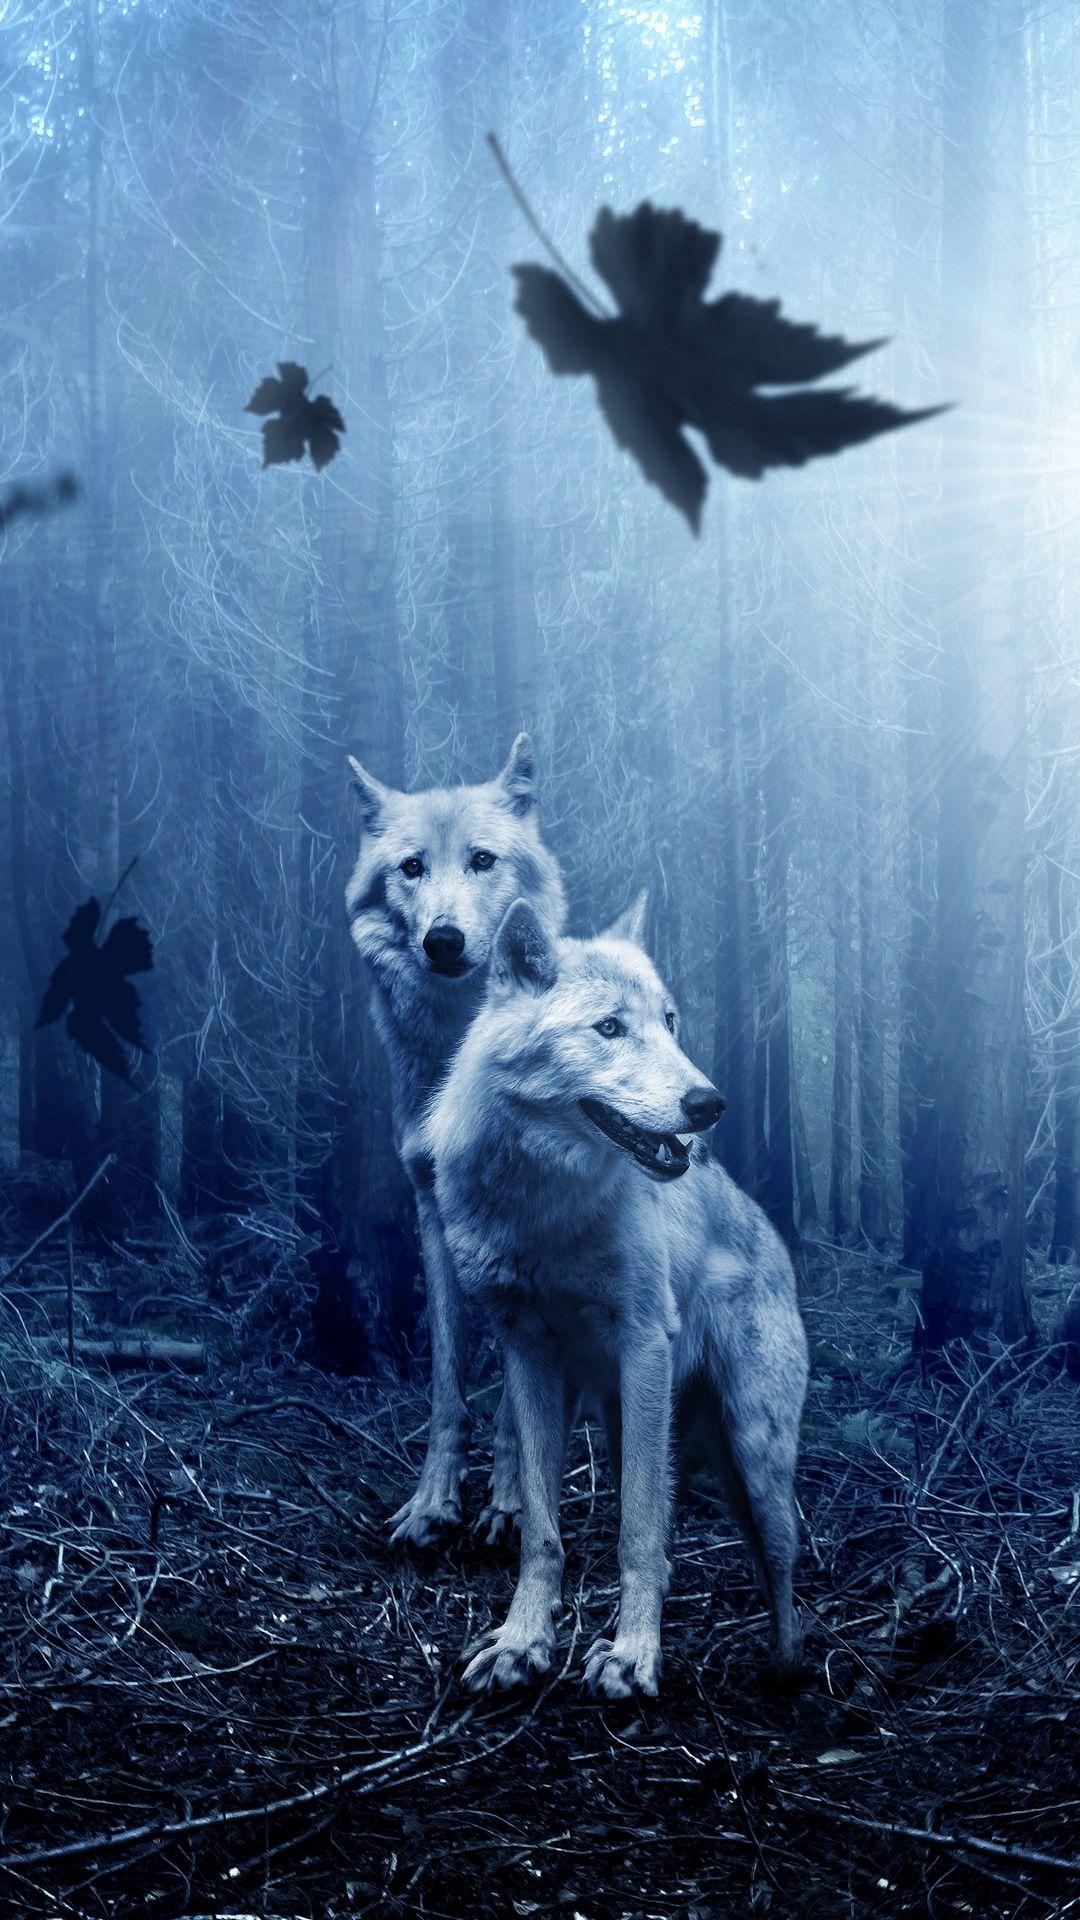 1080x1920 Wallpaper wolves, predators, forest, photoshop